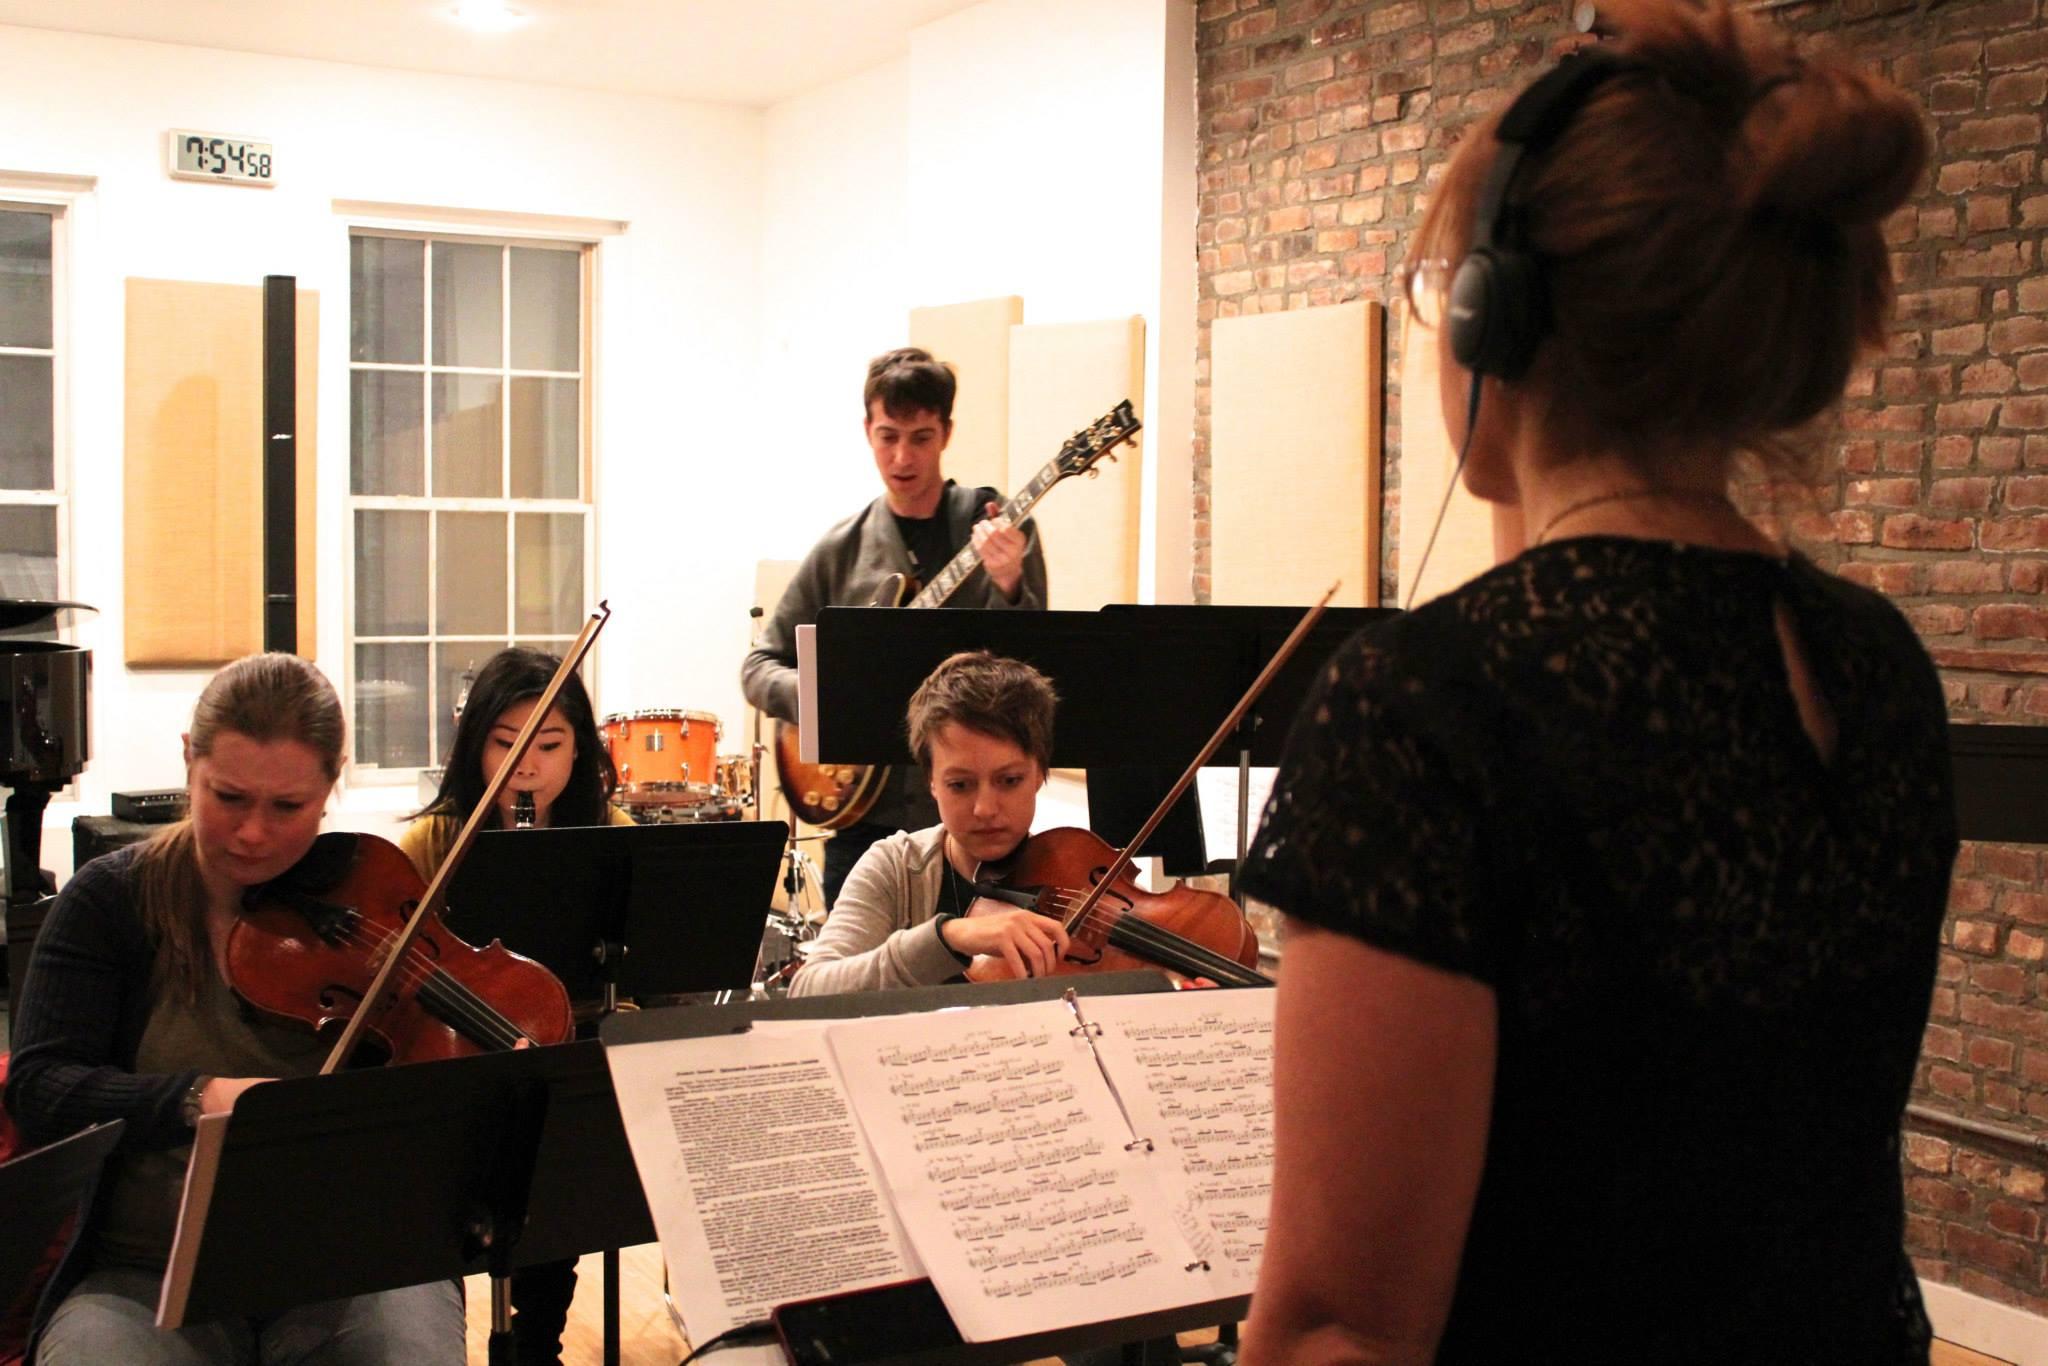 Conducting Hotel Elefant @ Michiko Rehearsal Studios, 2014 (Also Pictured: Isabel Kim, Hannis Brown, Gillian Gallagher, Kallie Ciechomski)